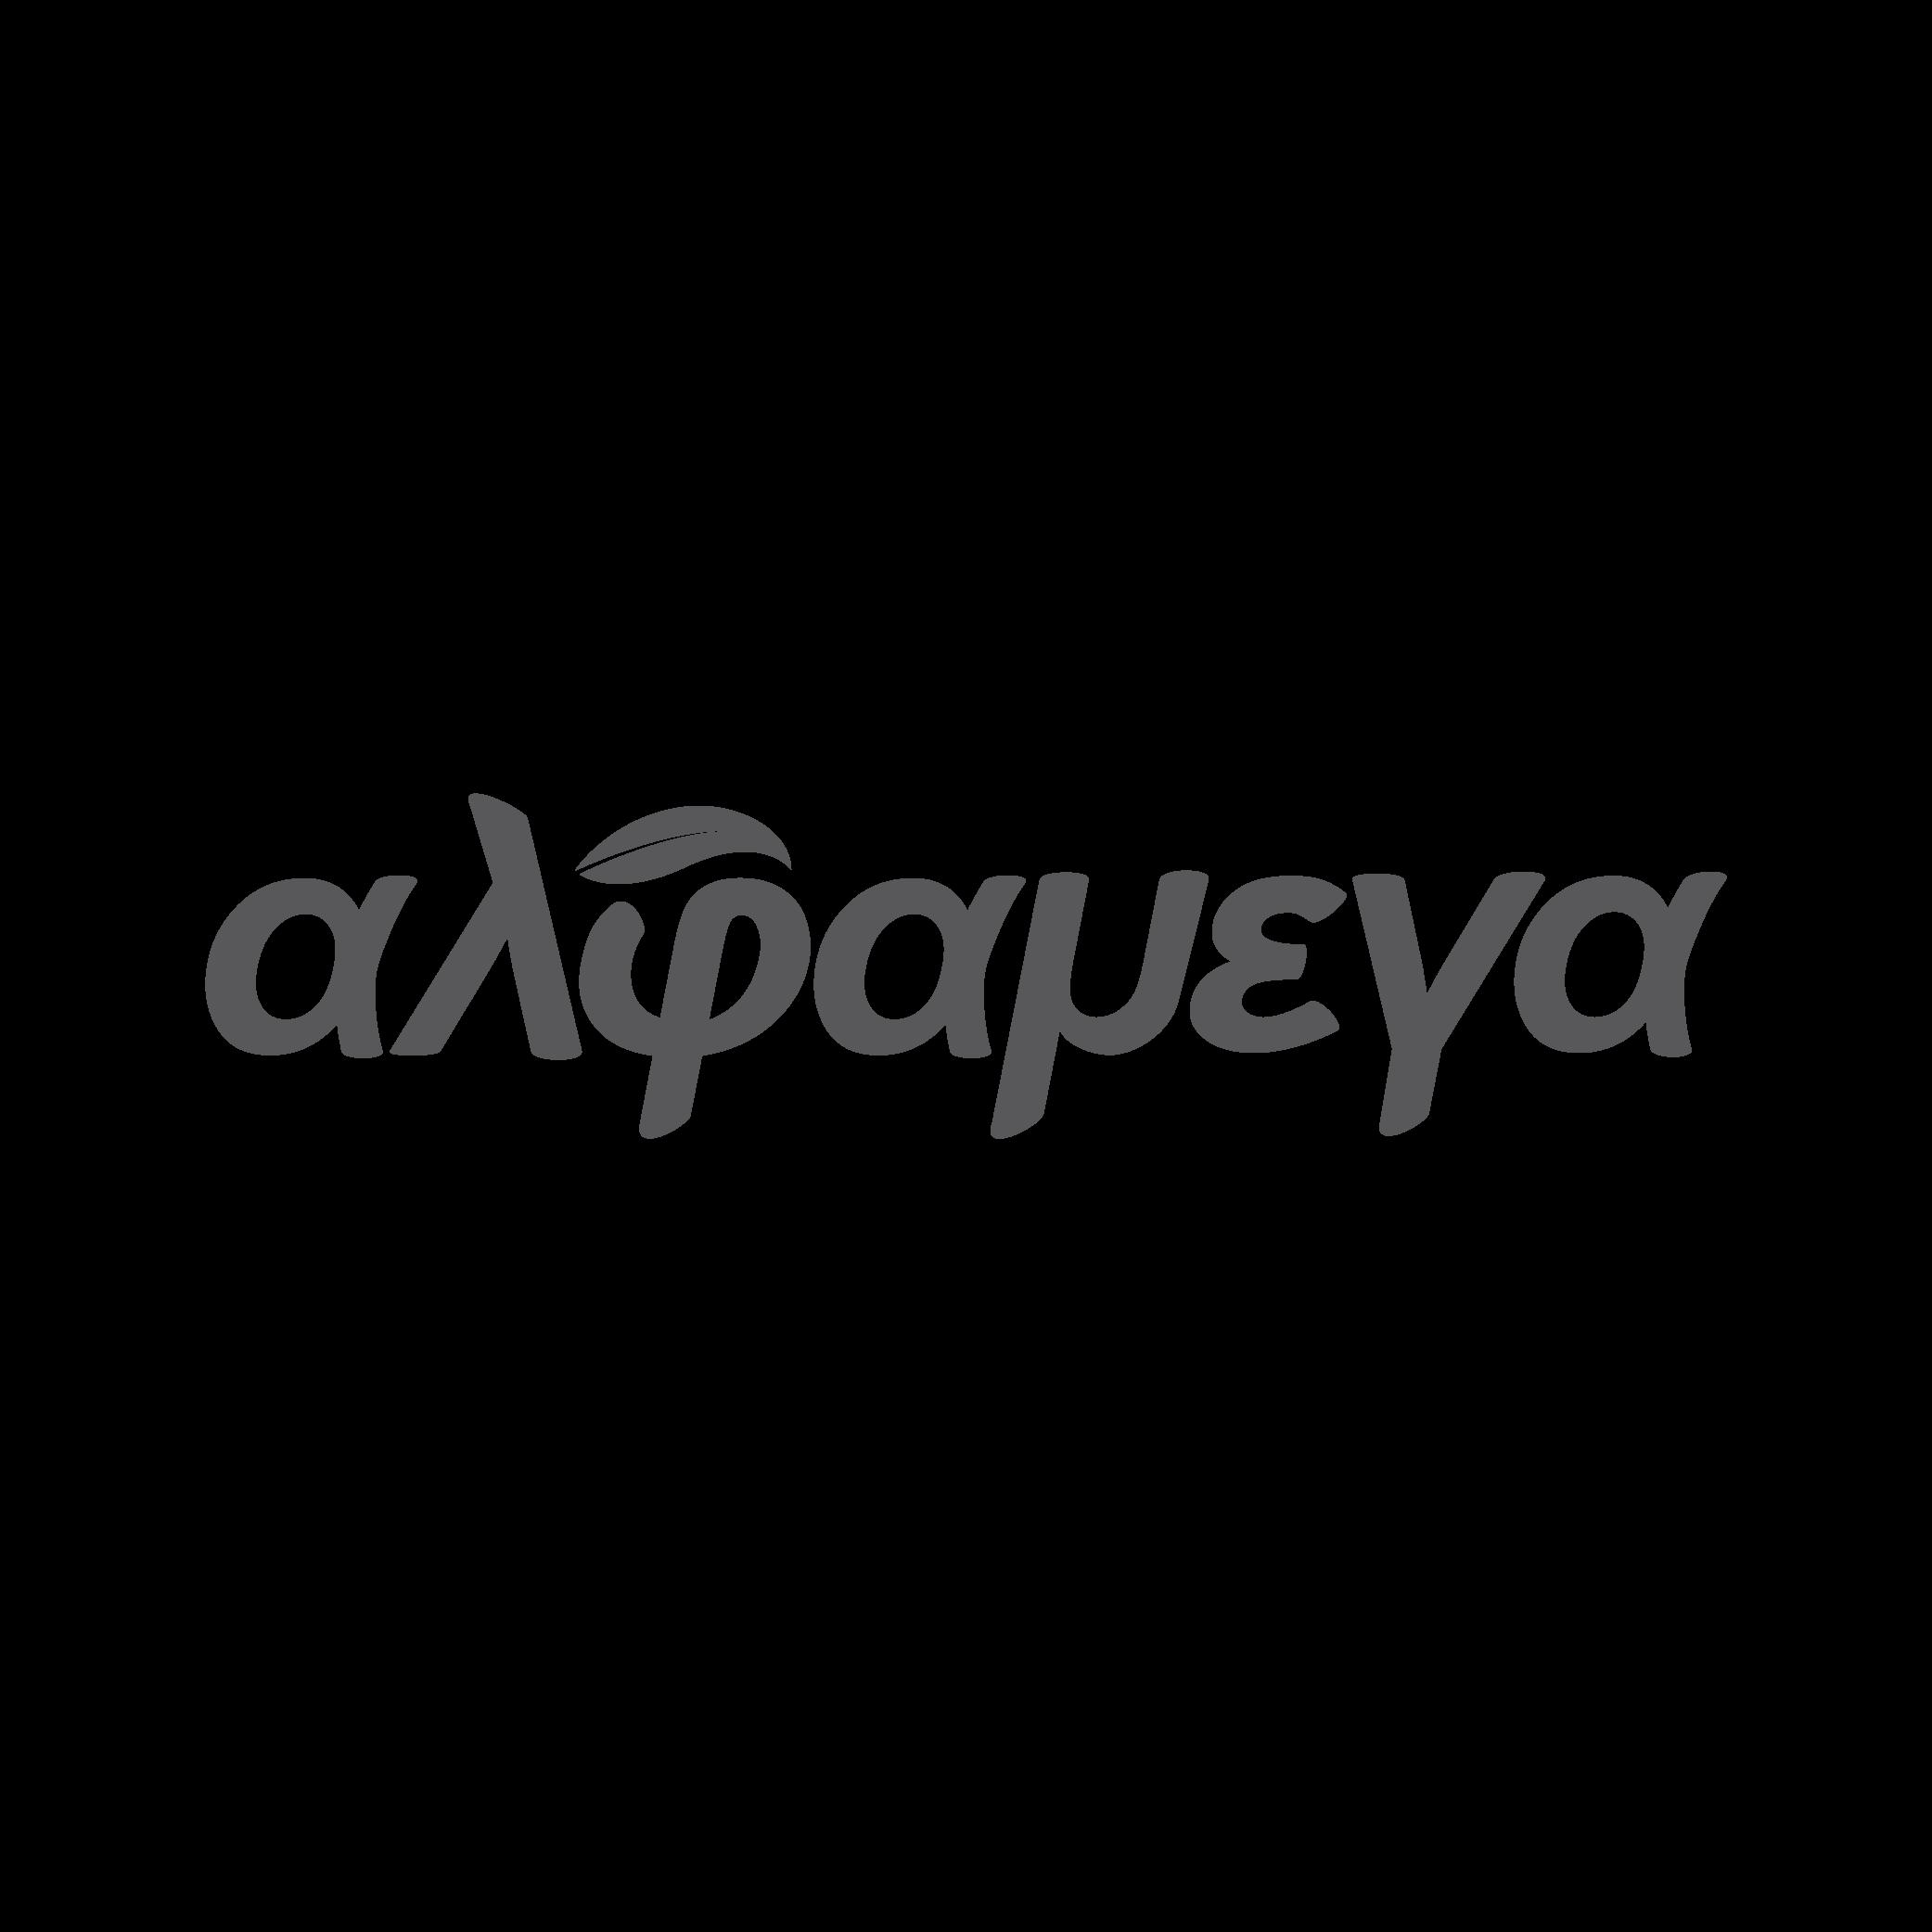 alfamega logo